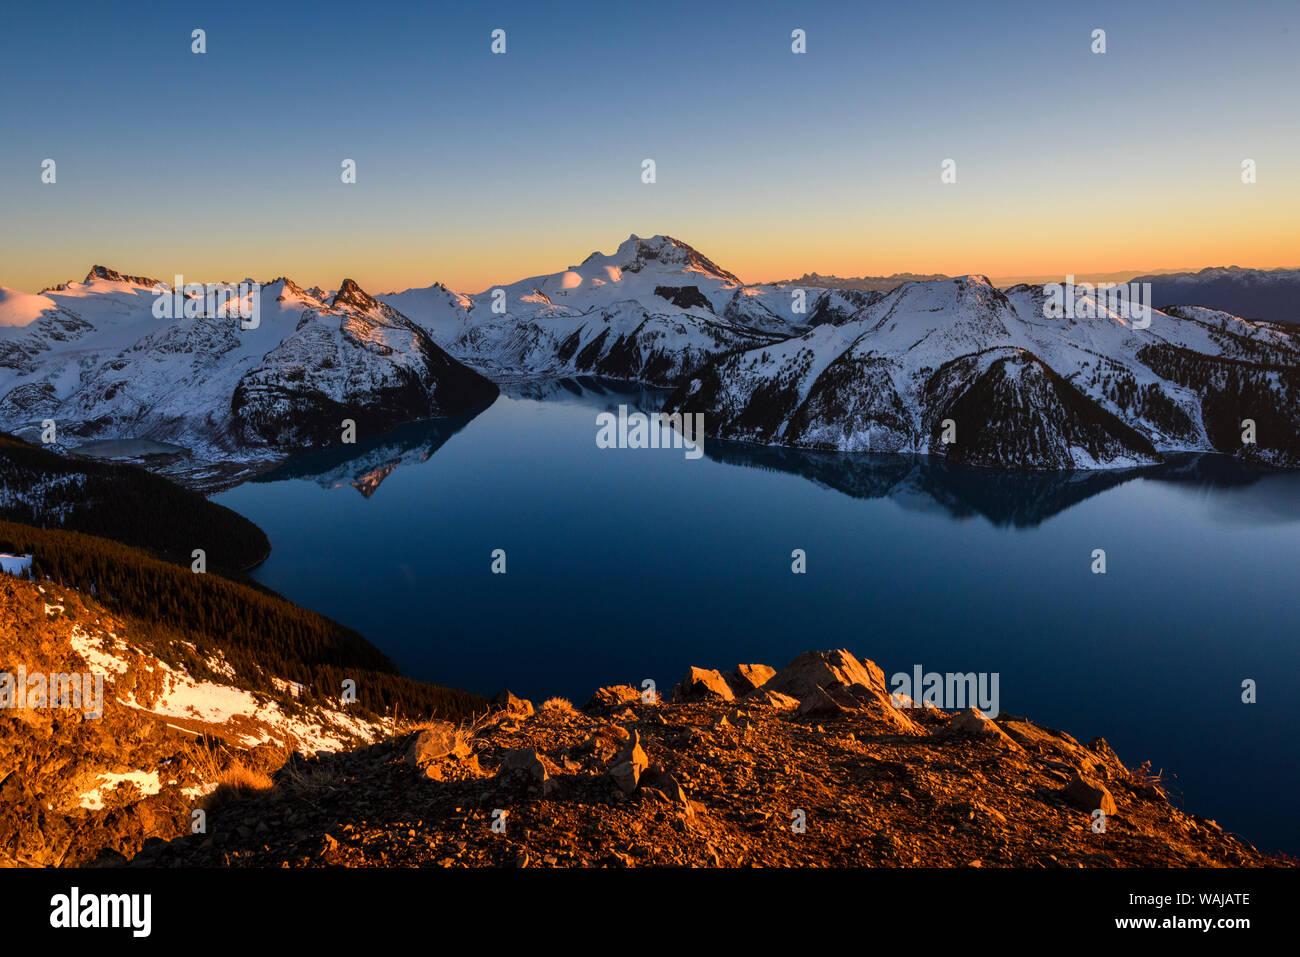 Canada, British Columbia, Garibaldi Provincial Park. Panorama Ridge at sunset. Stock Photo